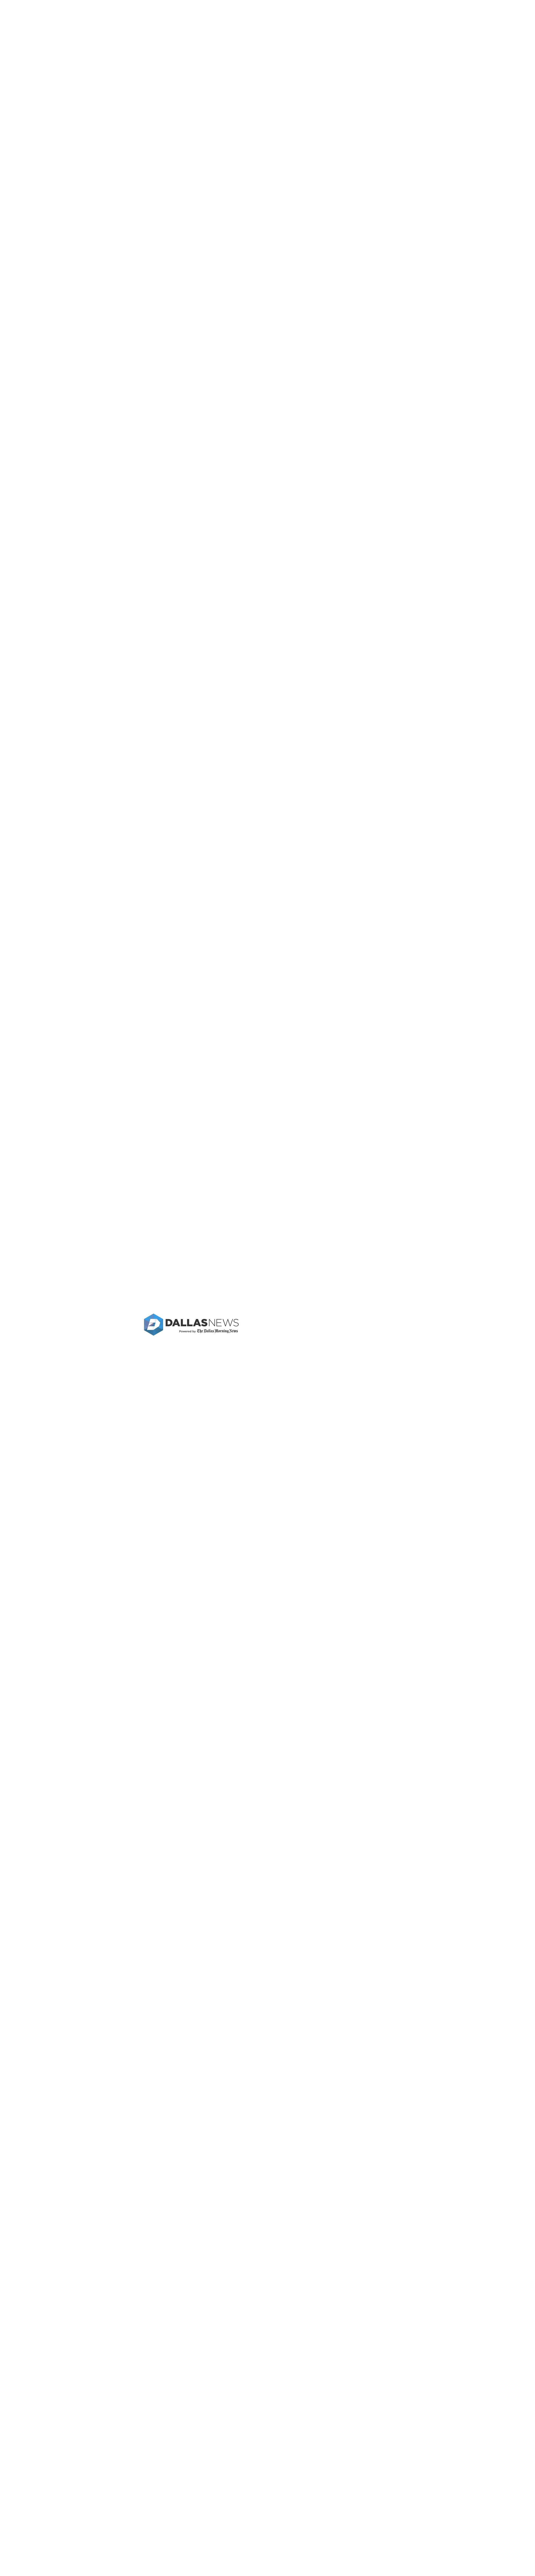 dallasnews.com at Thursday March 15, 2018, 11:02 a.m. UTC